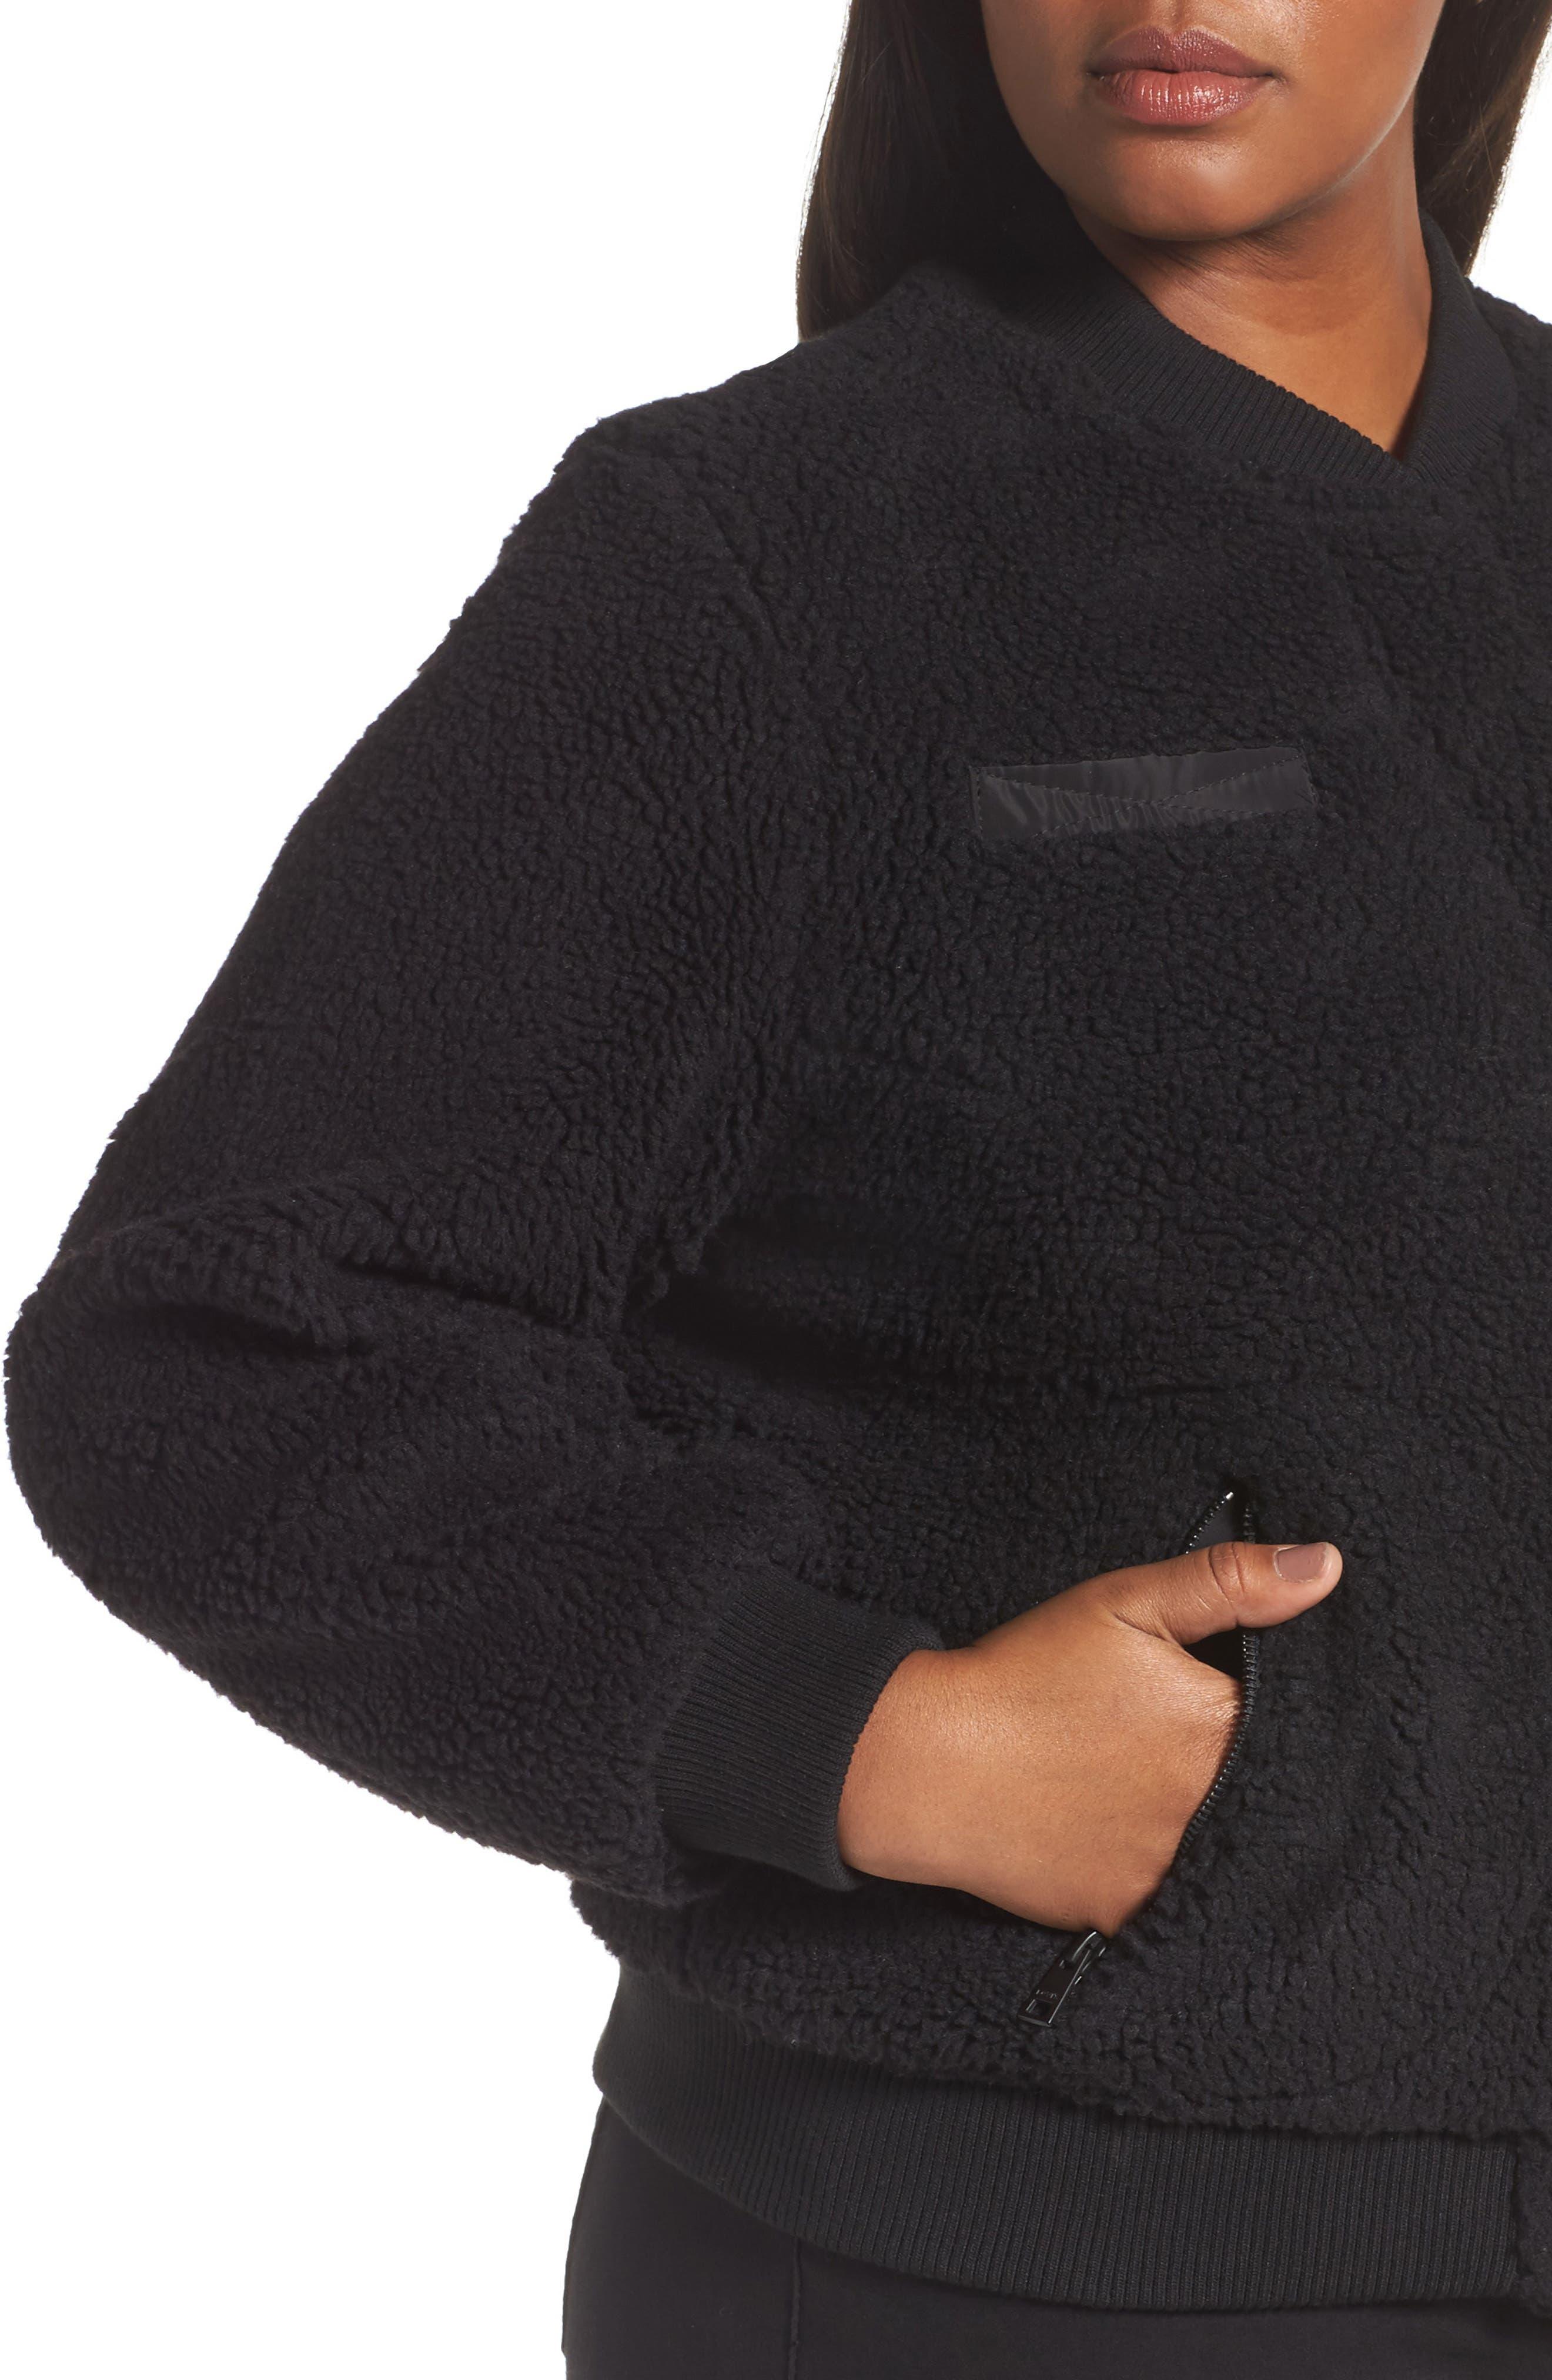 Rib Knit Fleece Bomber Jacket,                             Alternate thumbnail 4, color,                             Black